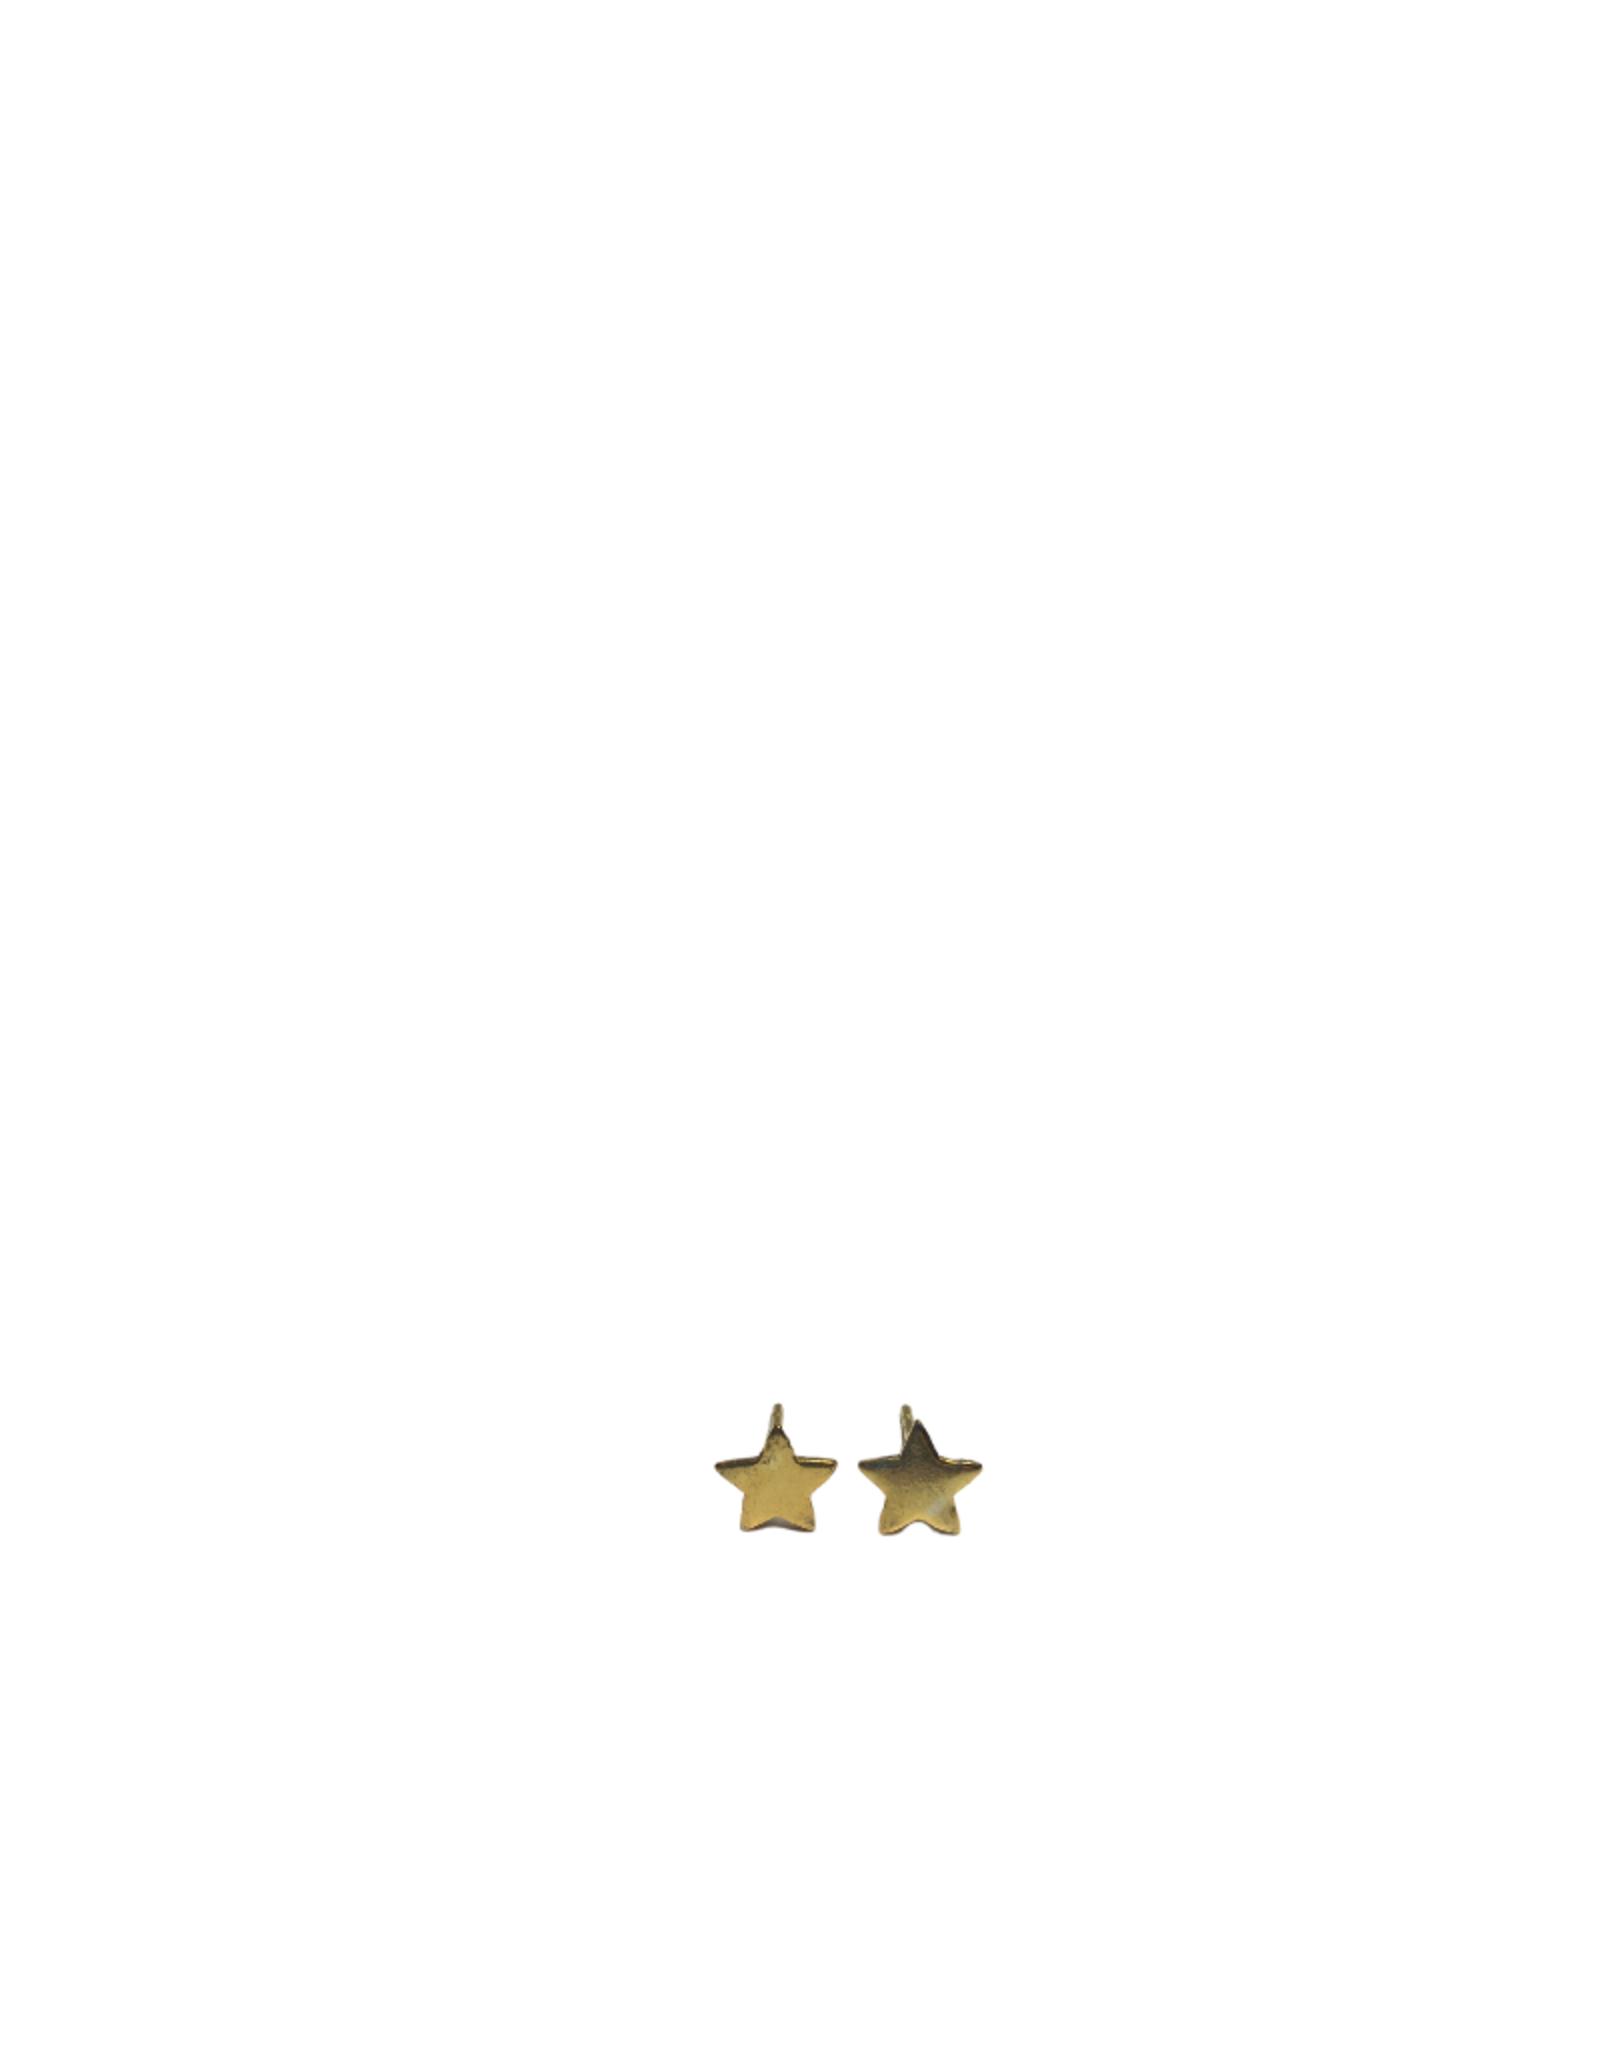 Gold Tone Star Earrings